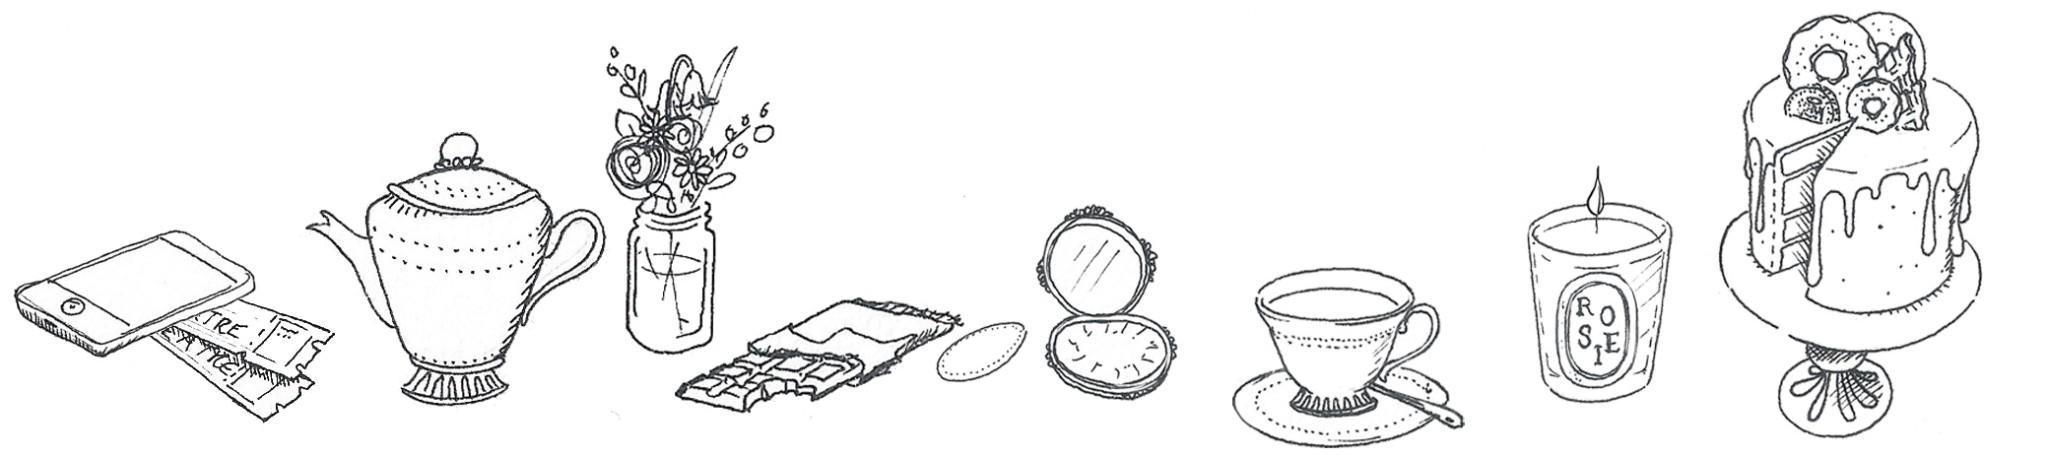 illustrations-rosie